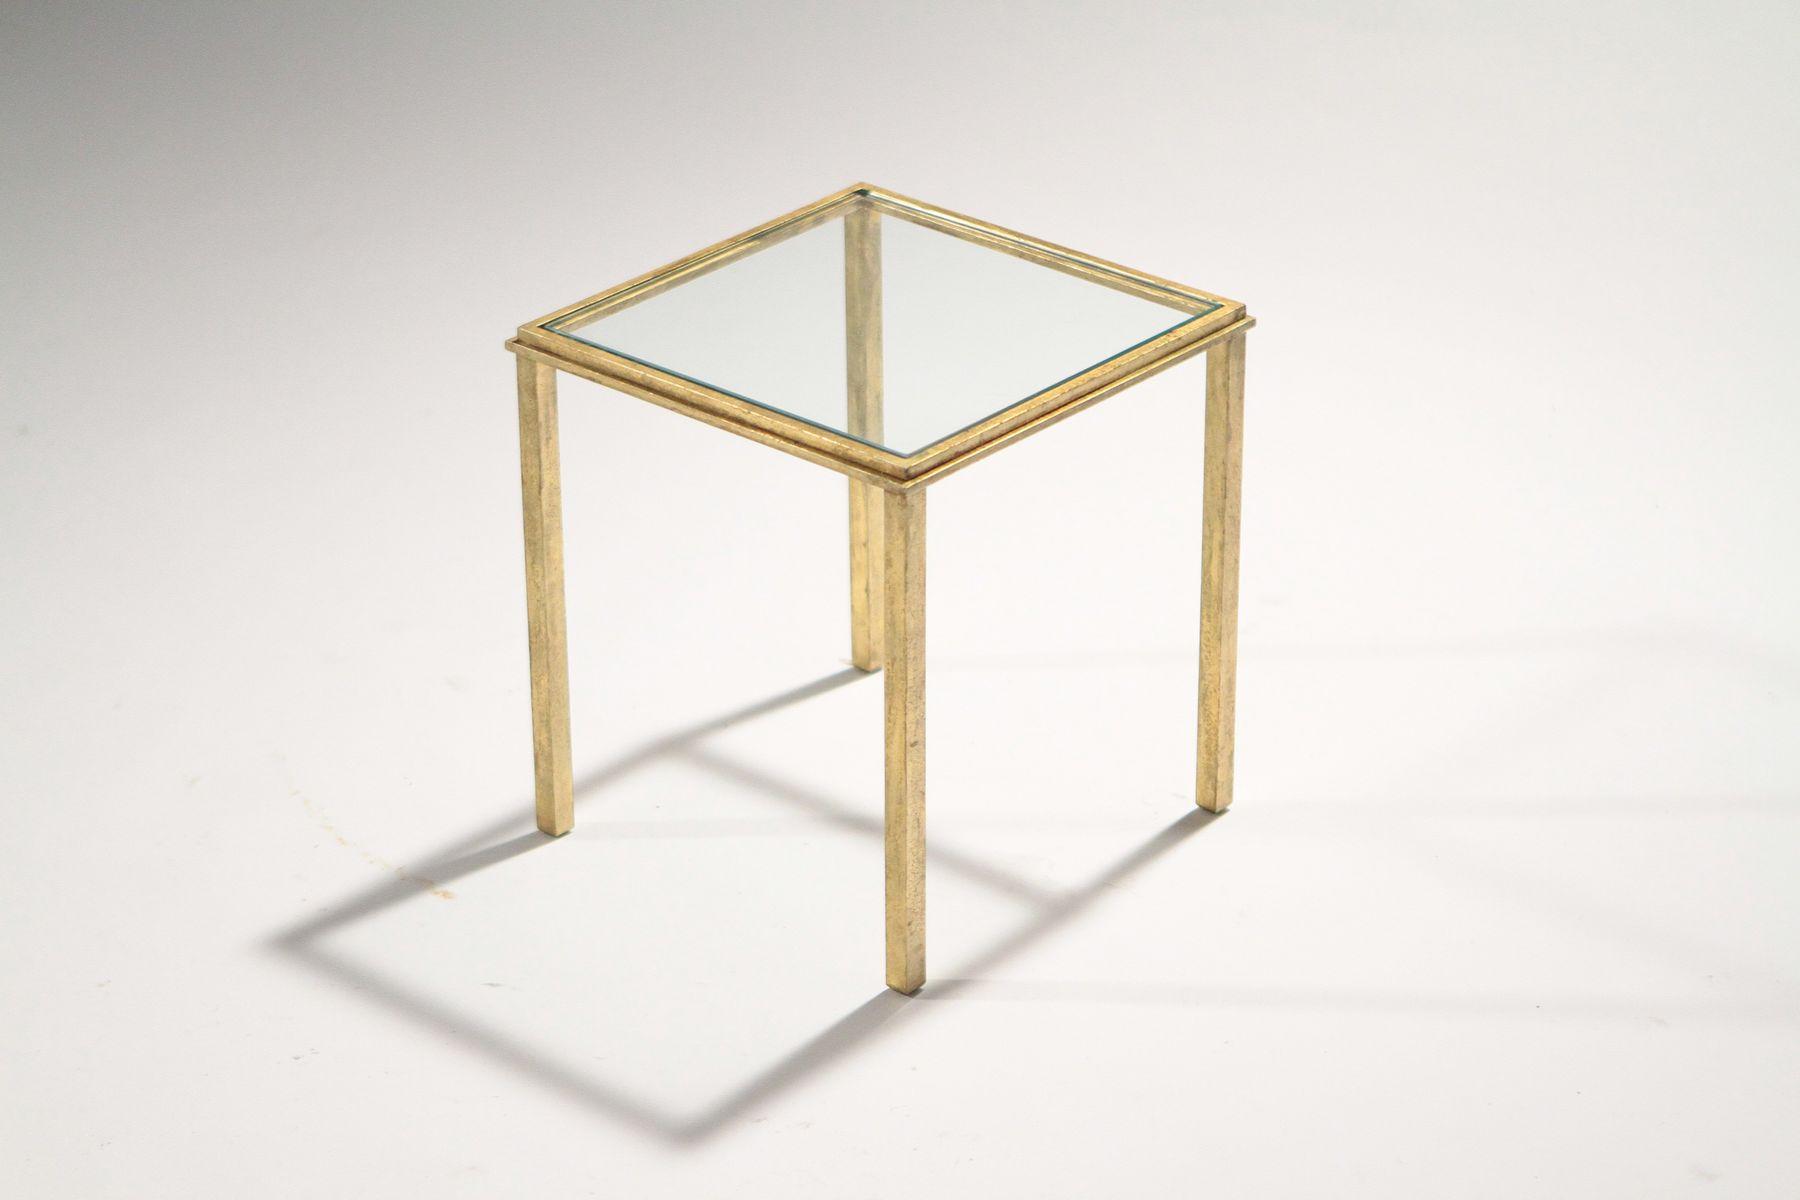 tables gigognes de maison ramsay 1950s en vente sur pamono. Black Bedroom Furniture Sets. Home Design Ideas